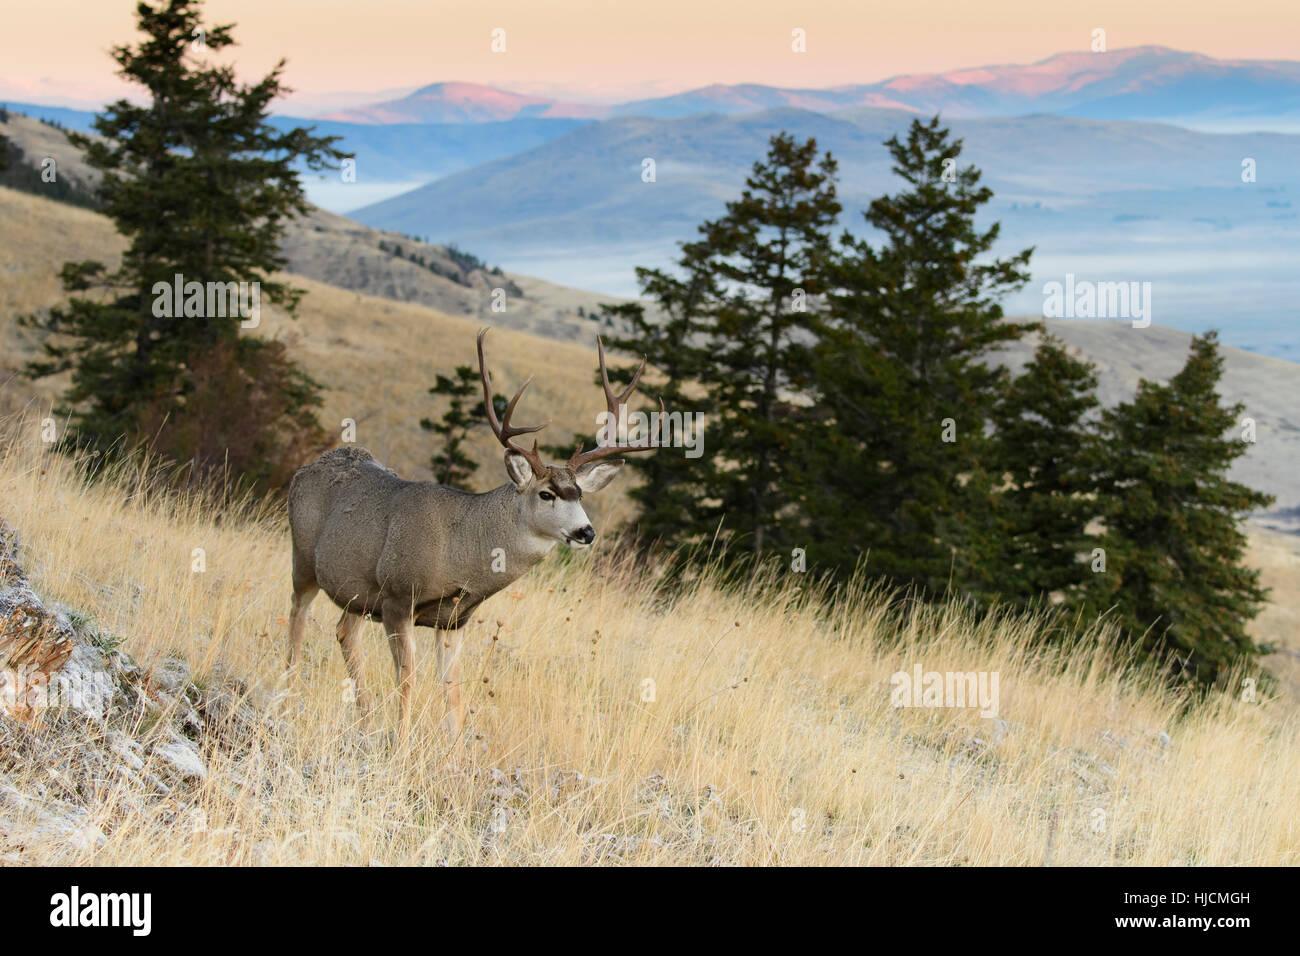 Mule Deer Buck (Odocoileus hemionus), Western North America - Stock Image